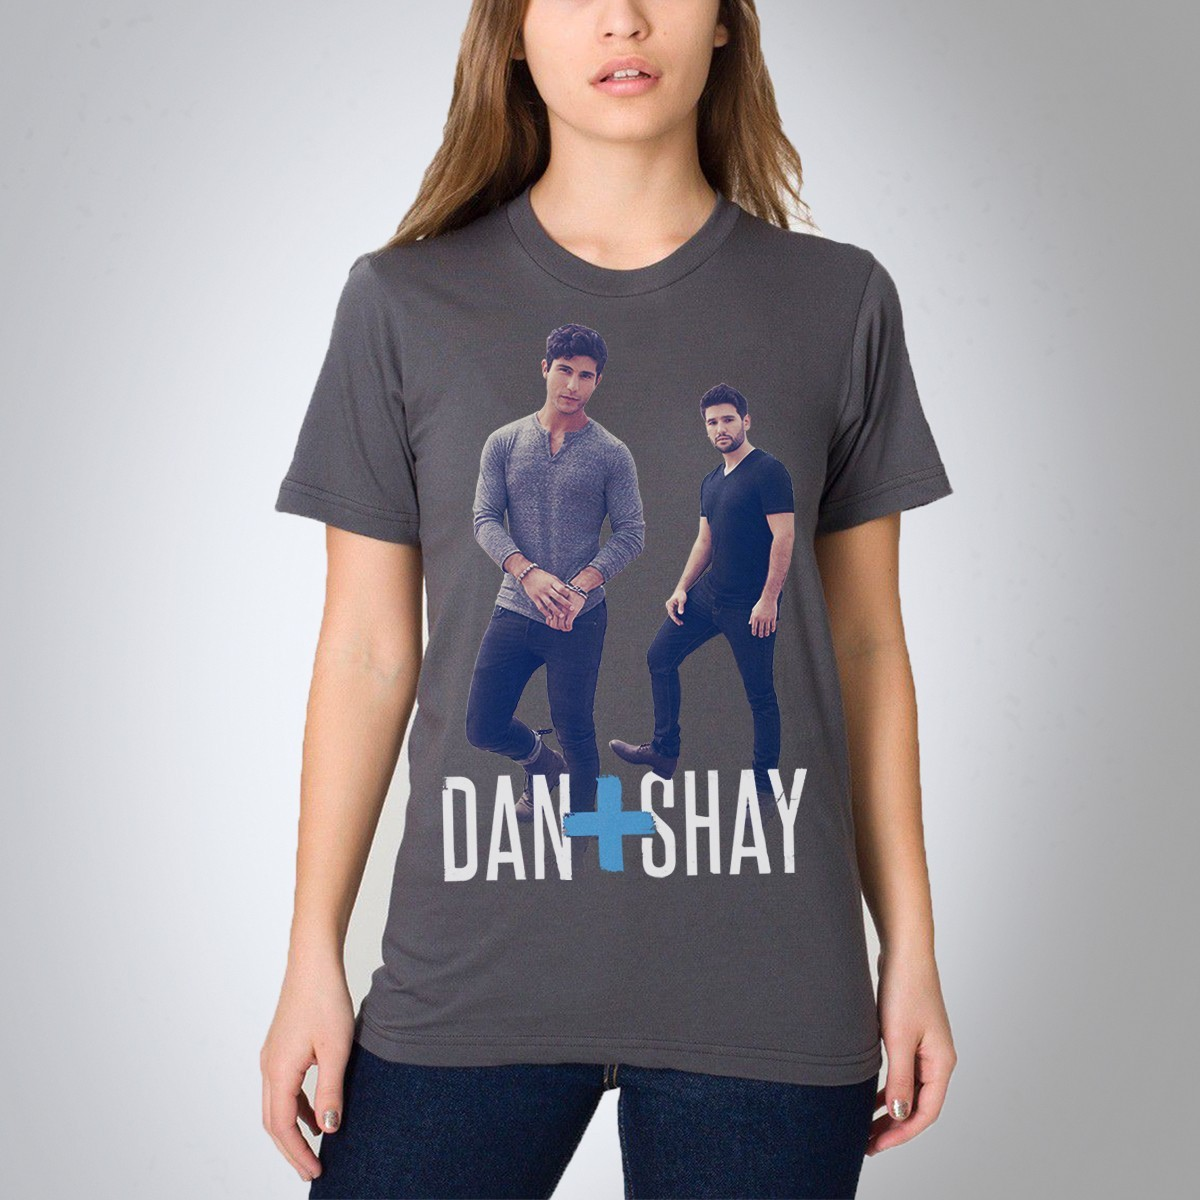 where_it_all_began_t-shirt-girl-dan_shay_1.jpg